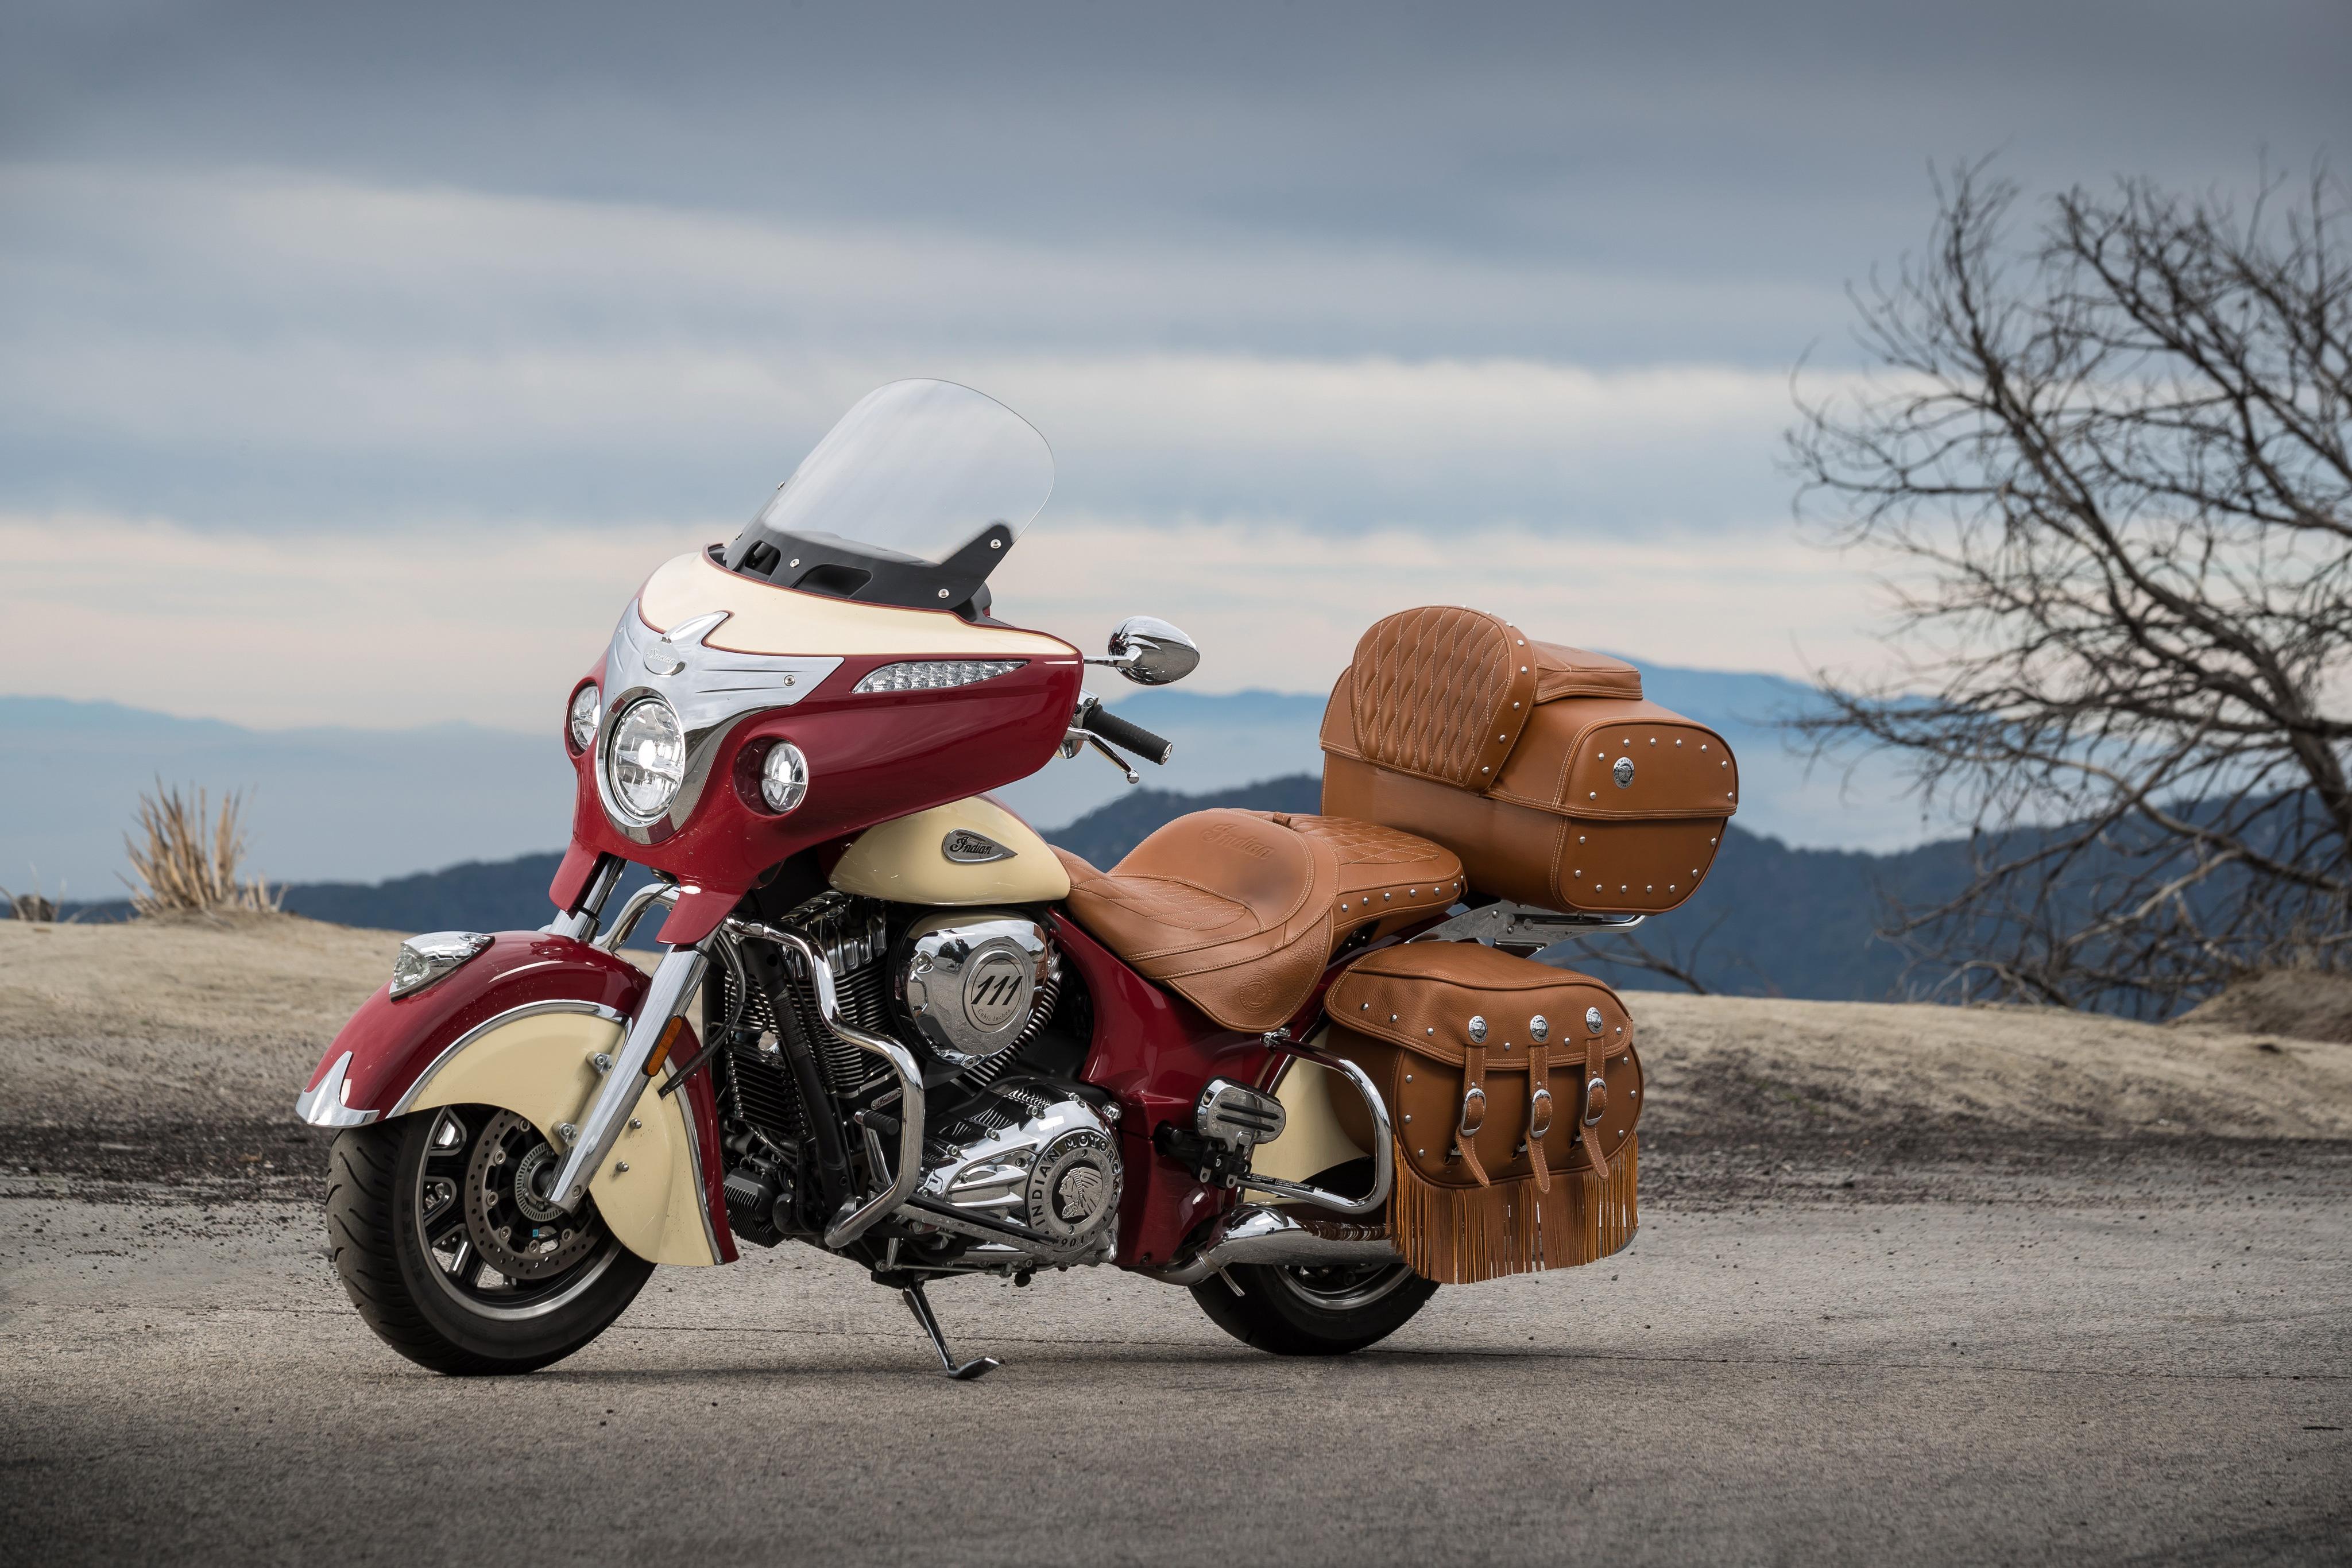 Download wallpaper 3840x2400 motorcycle, motorcyclist, rally, racing, drift, offroad 4k ultra hd